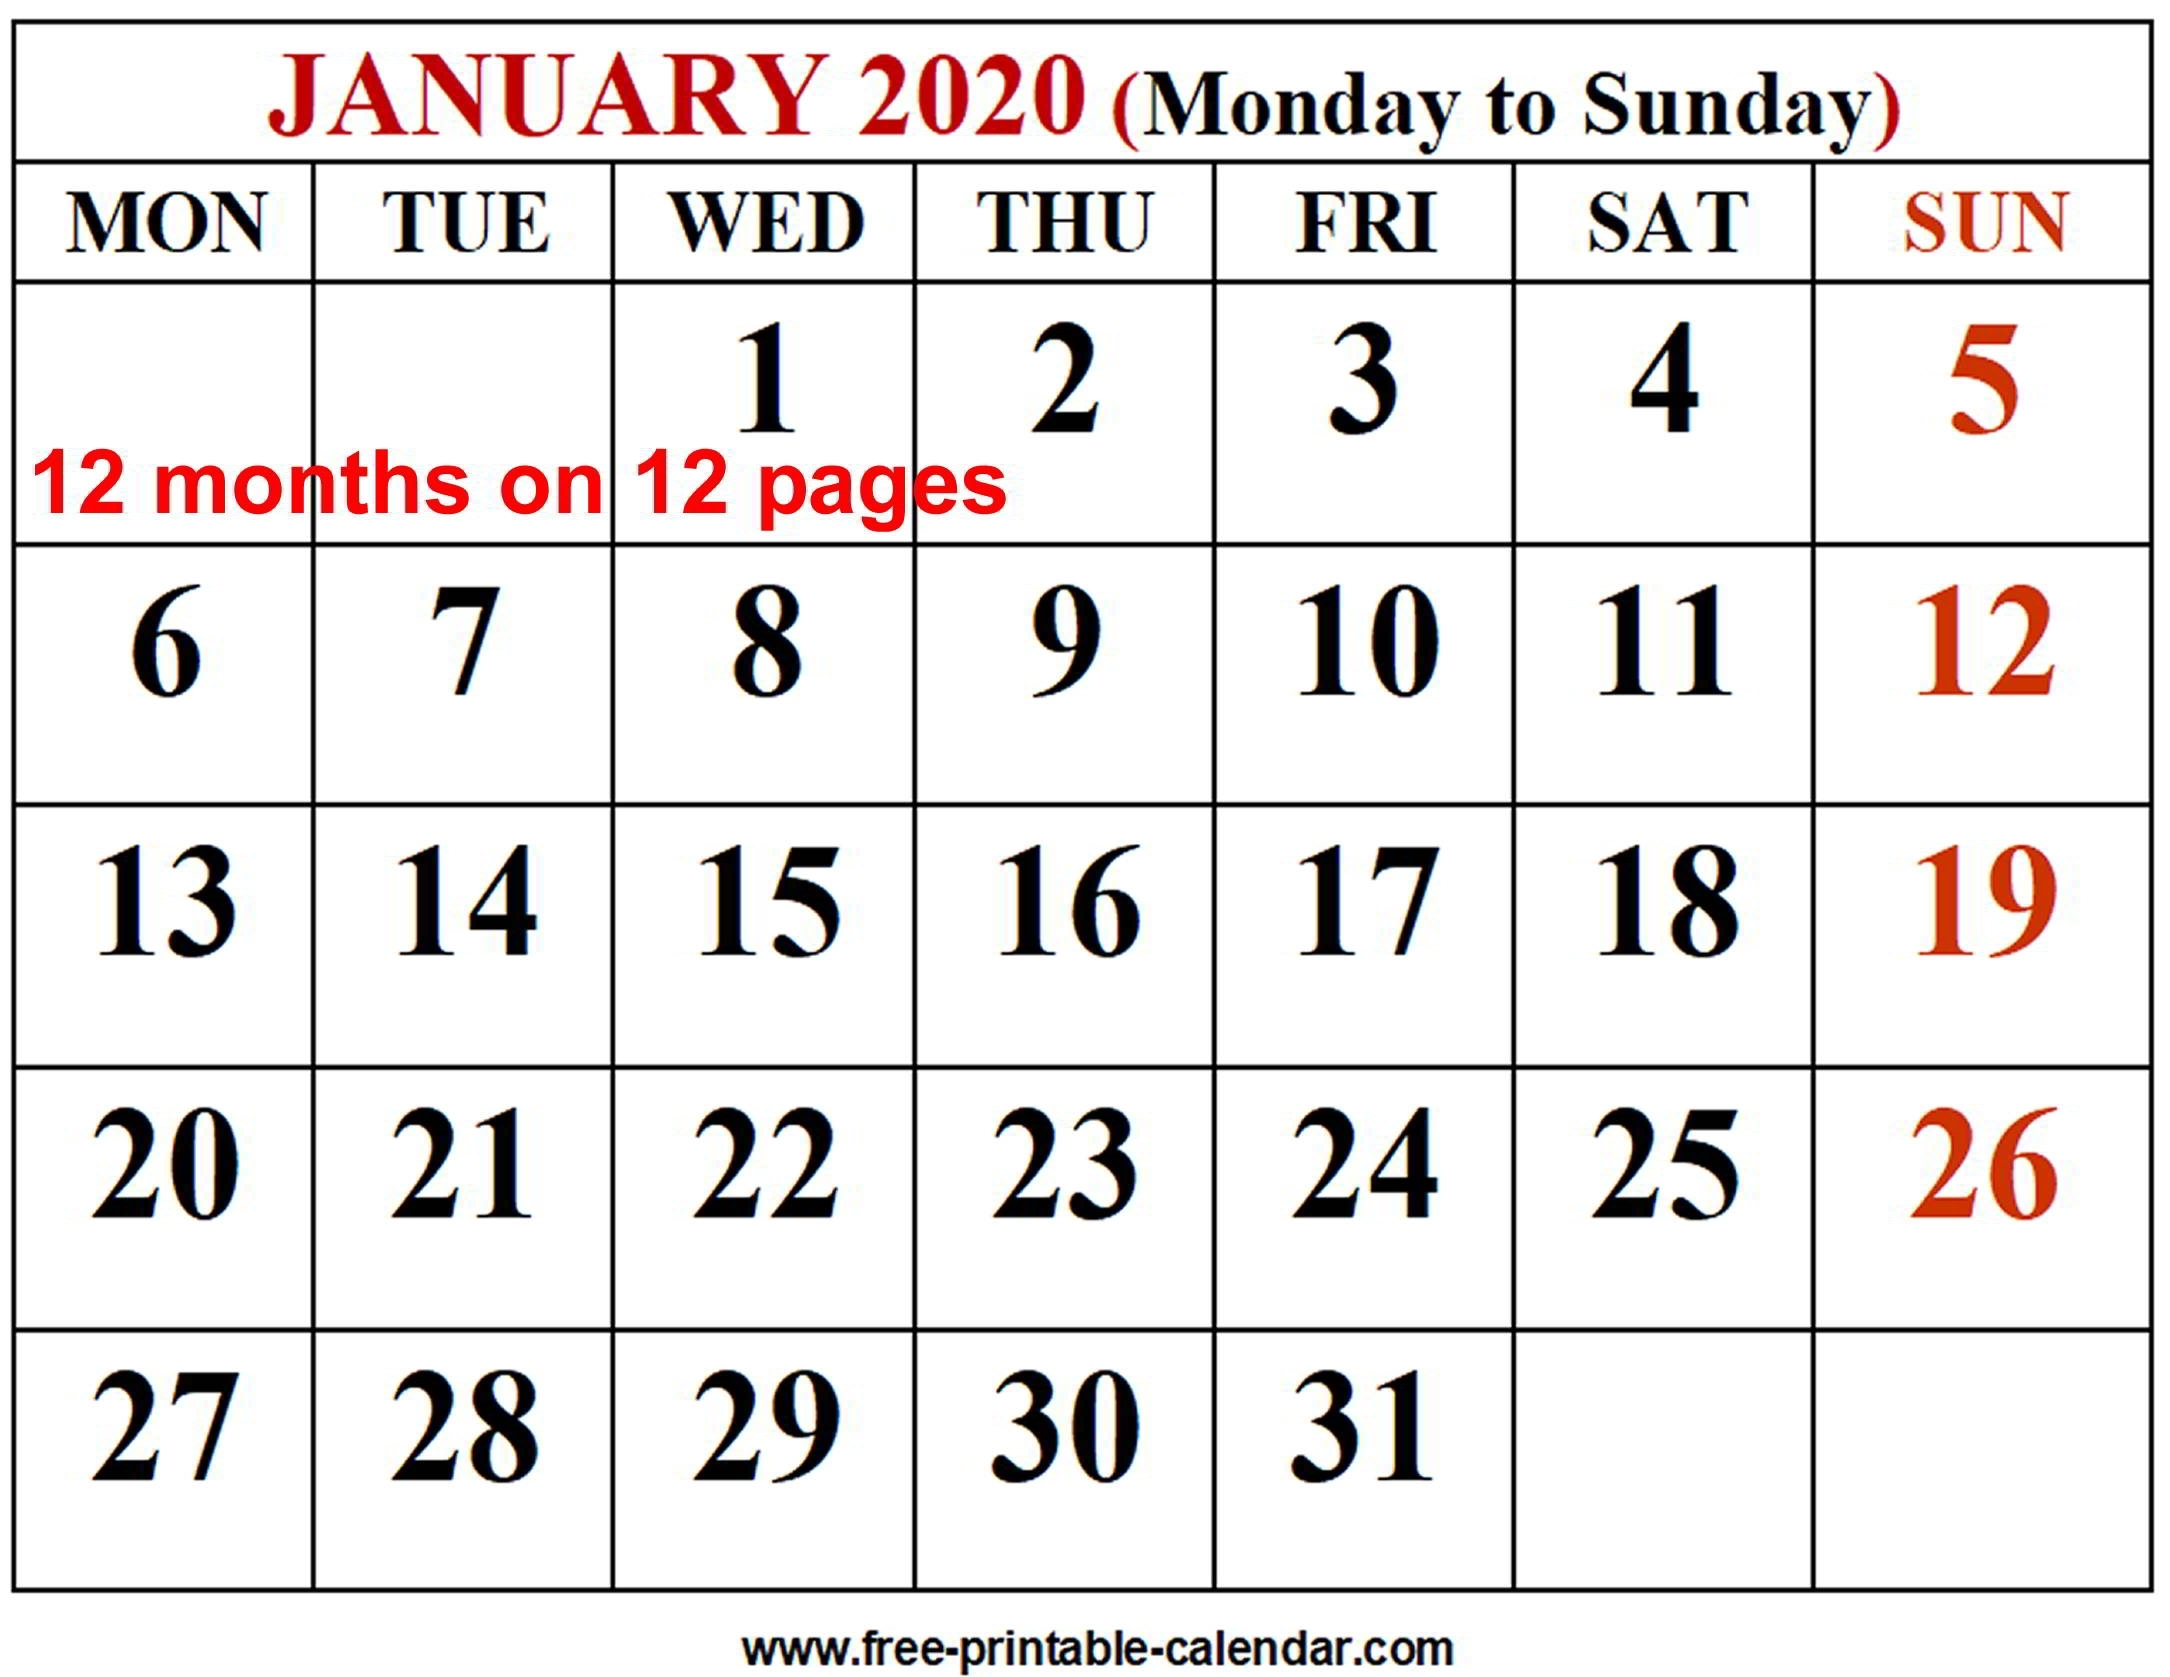 2020 Calendar Template - Free-Printable-Calendar inside Printable Calendar 2020 Monday To Sunday